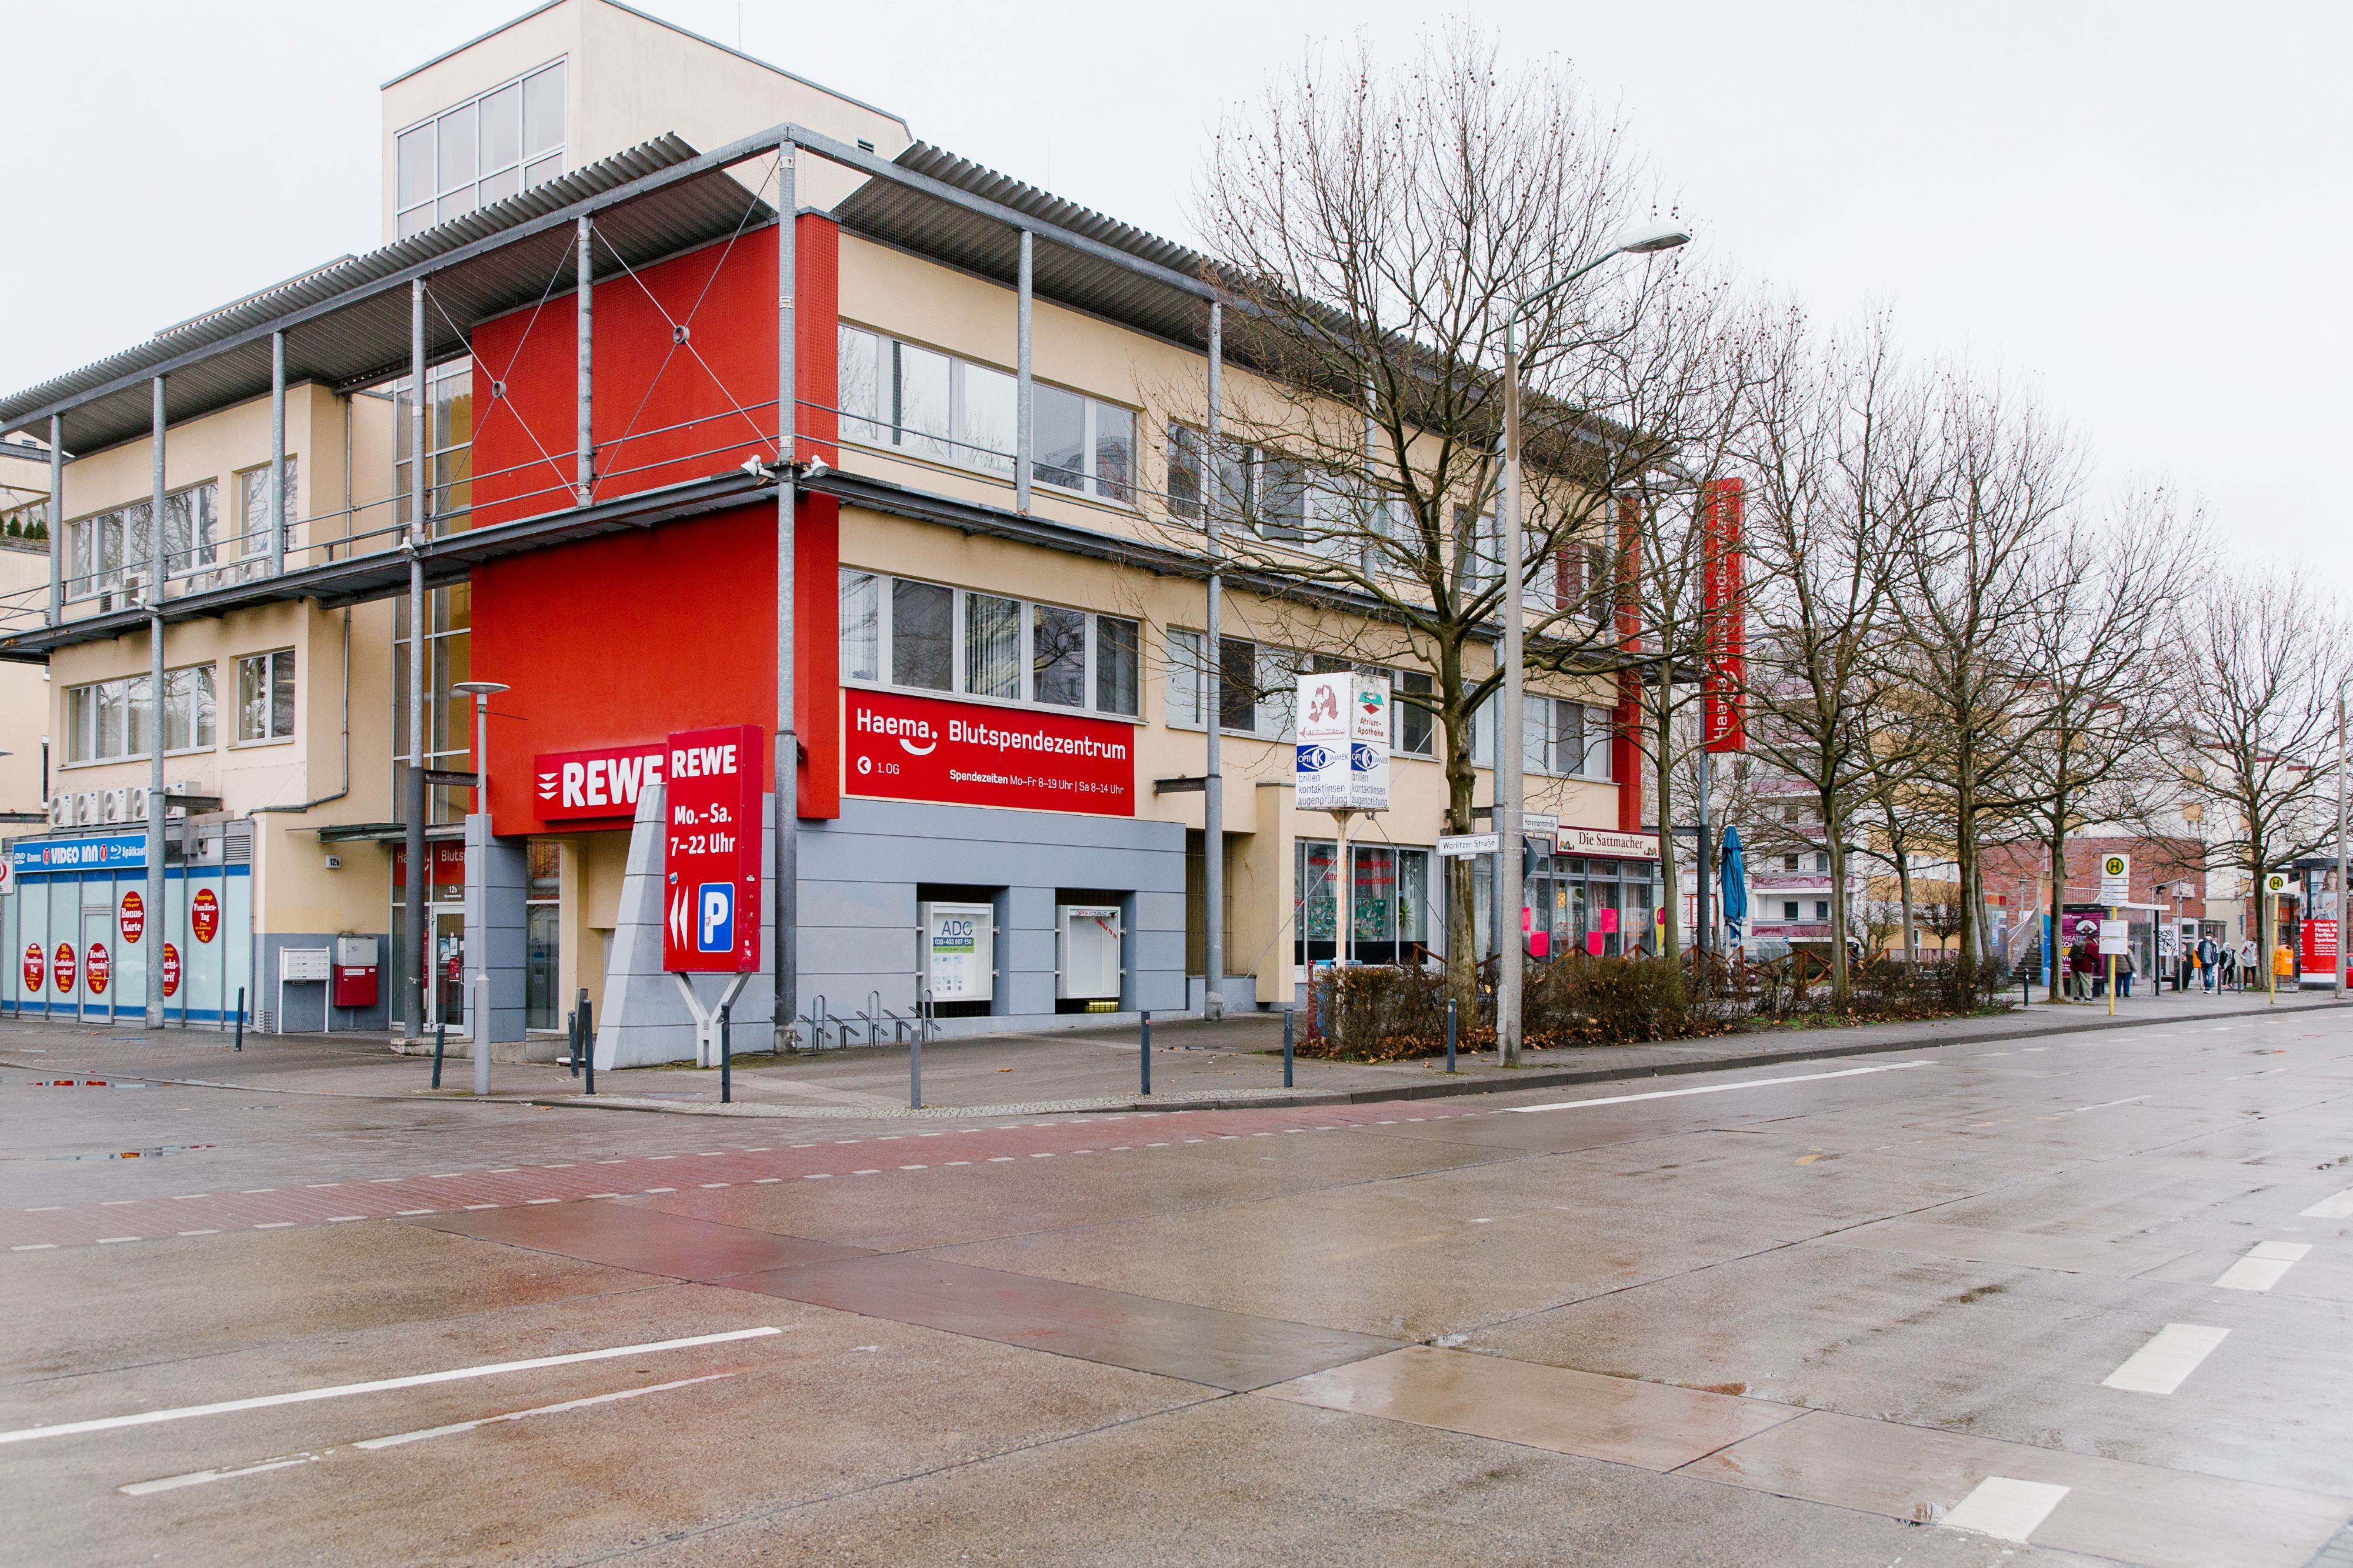 Haema Blutspendezentrum Berlin-Marzahn